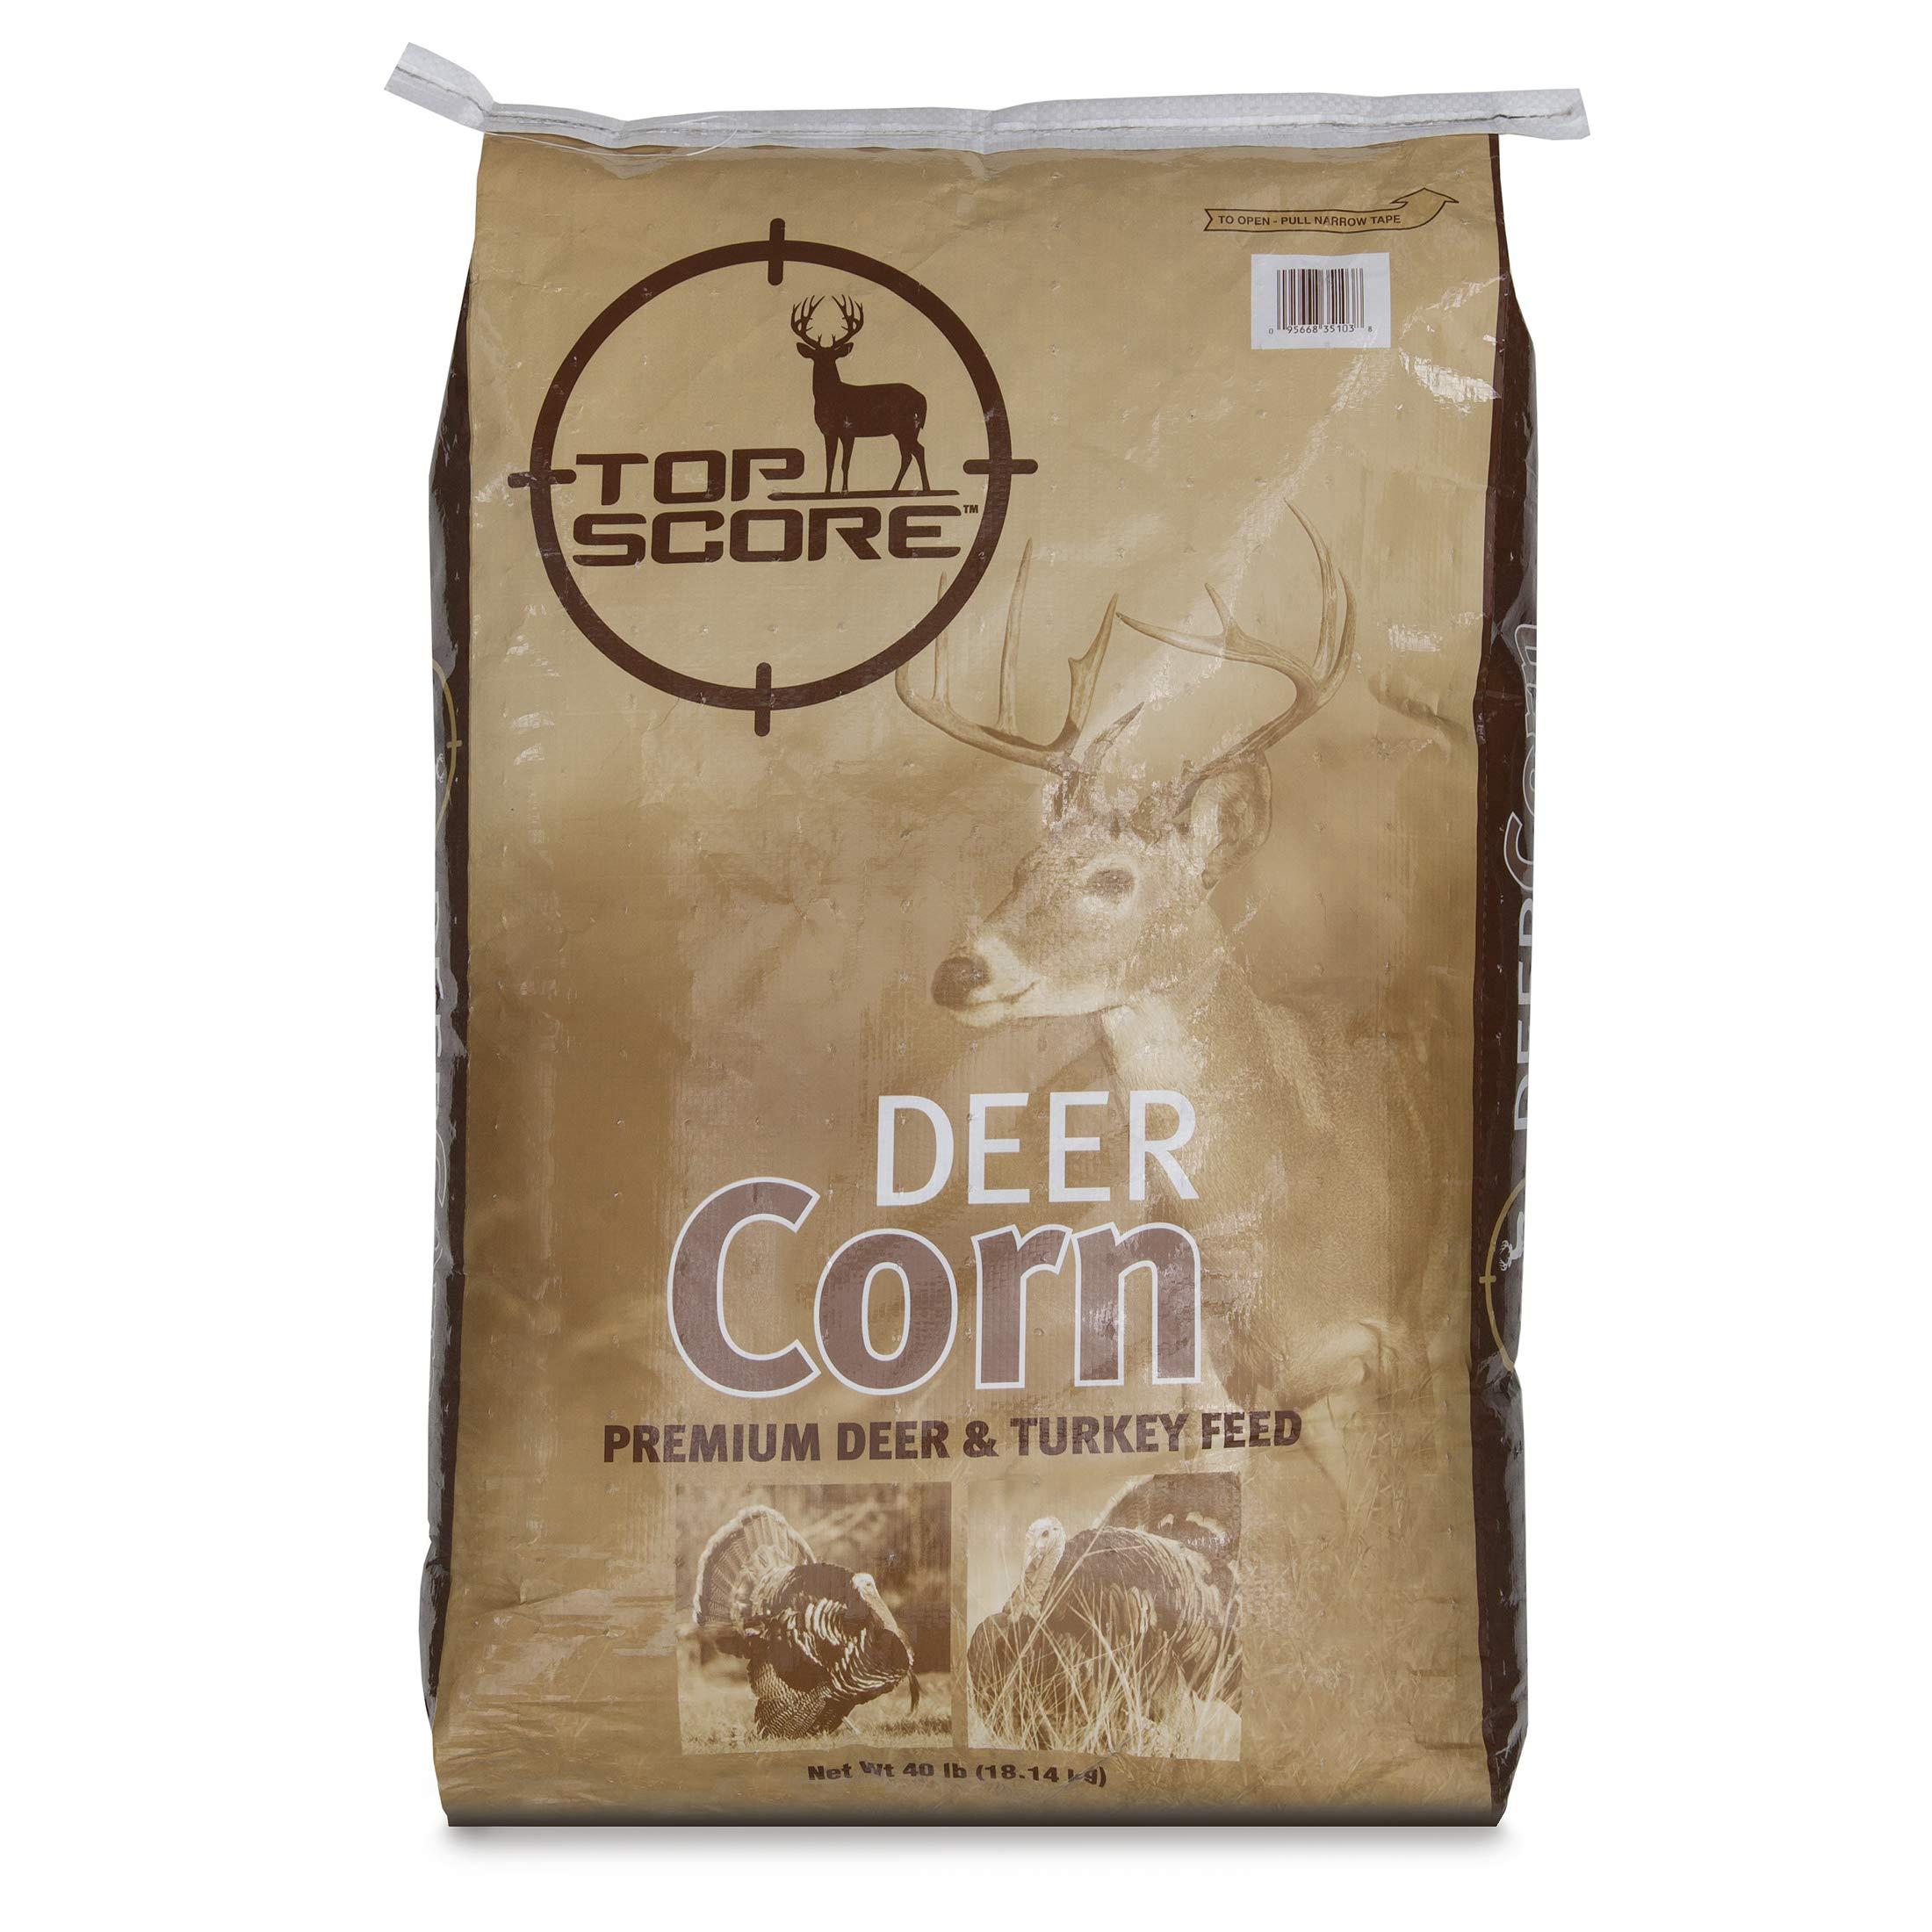 Manna Pro Top Score Deer Corn, 40lb